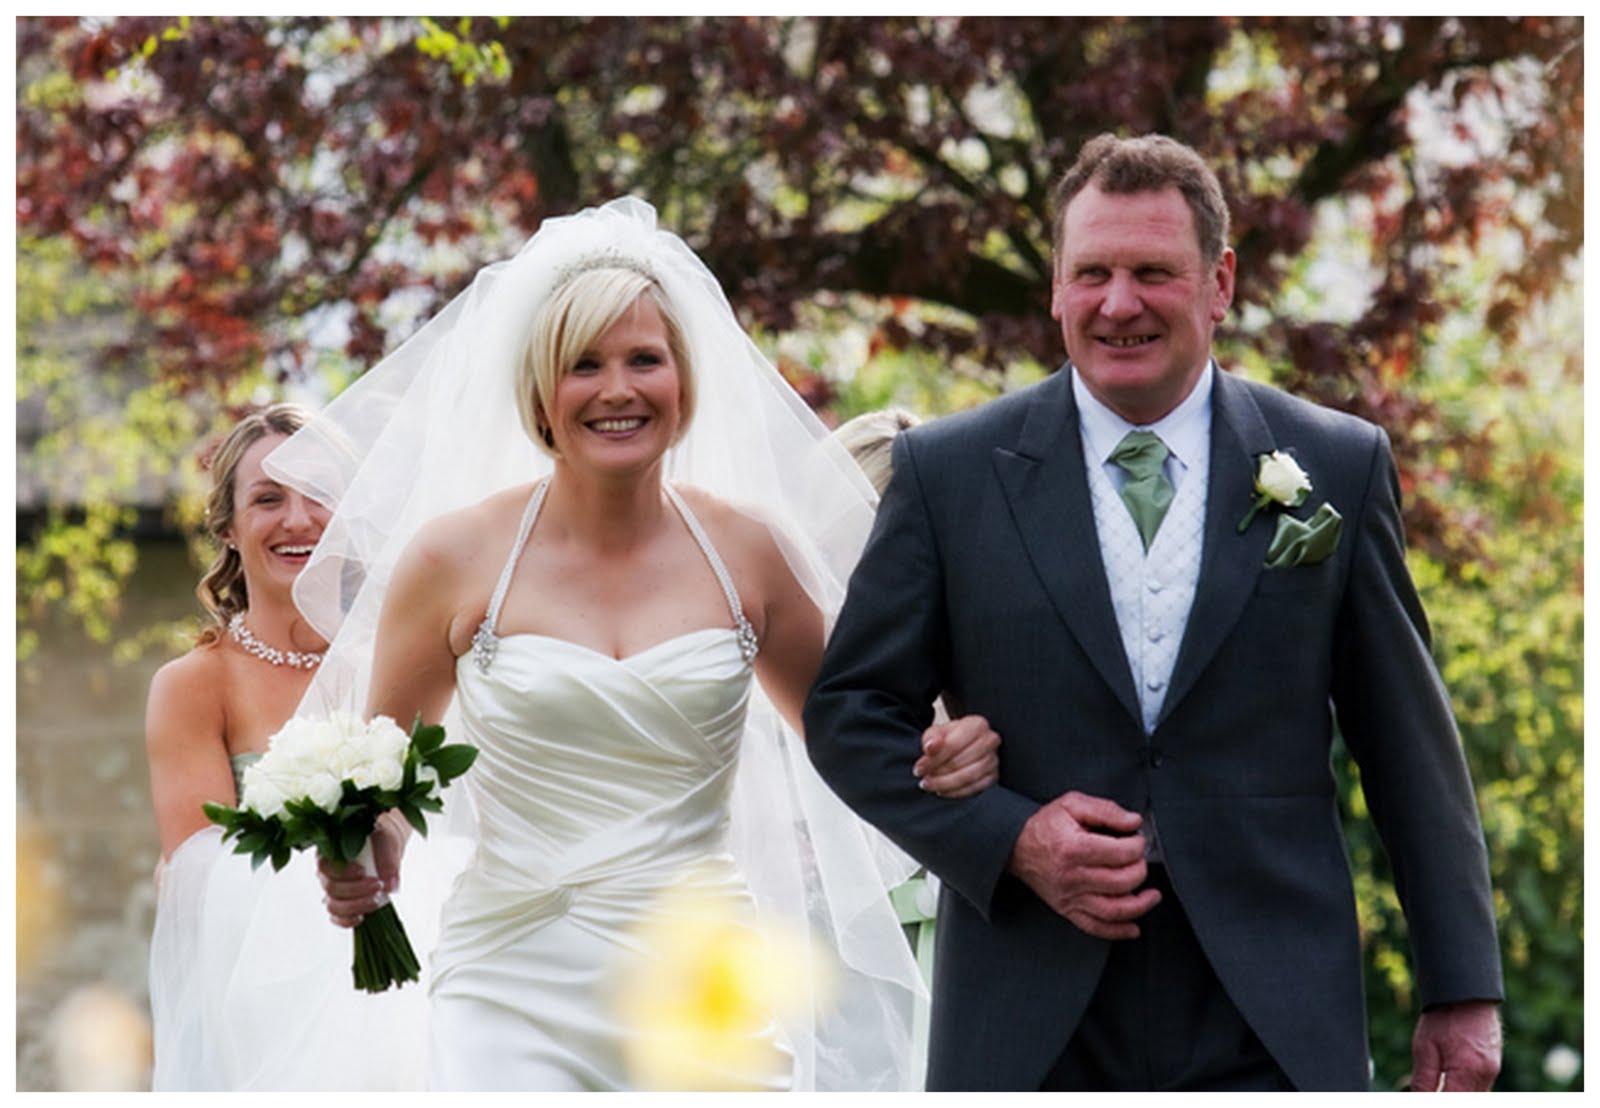 Shana McMahon and Sean Randall Wedding Registry